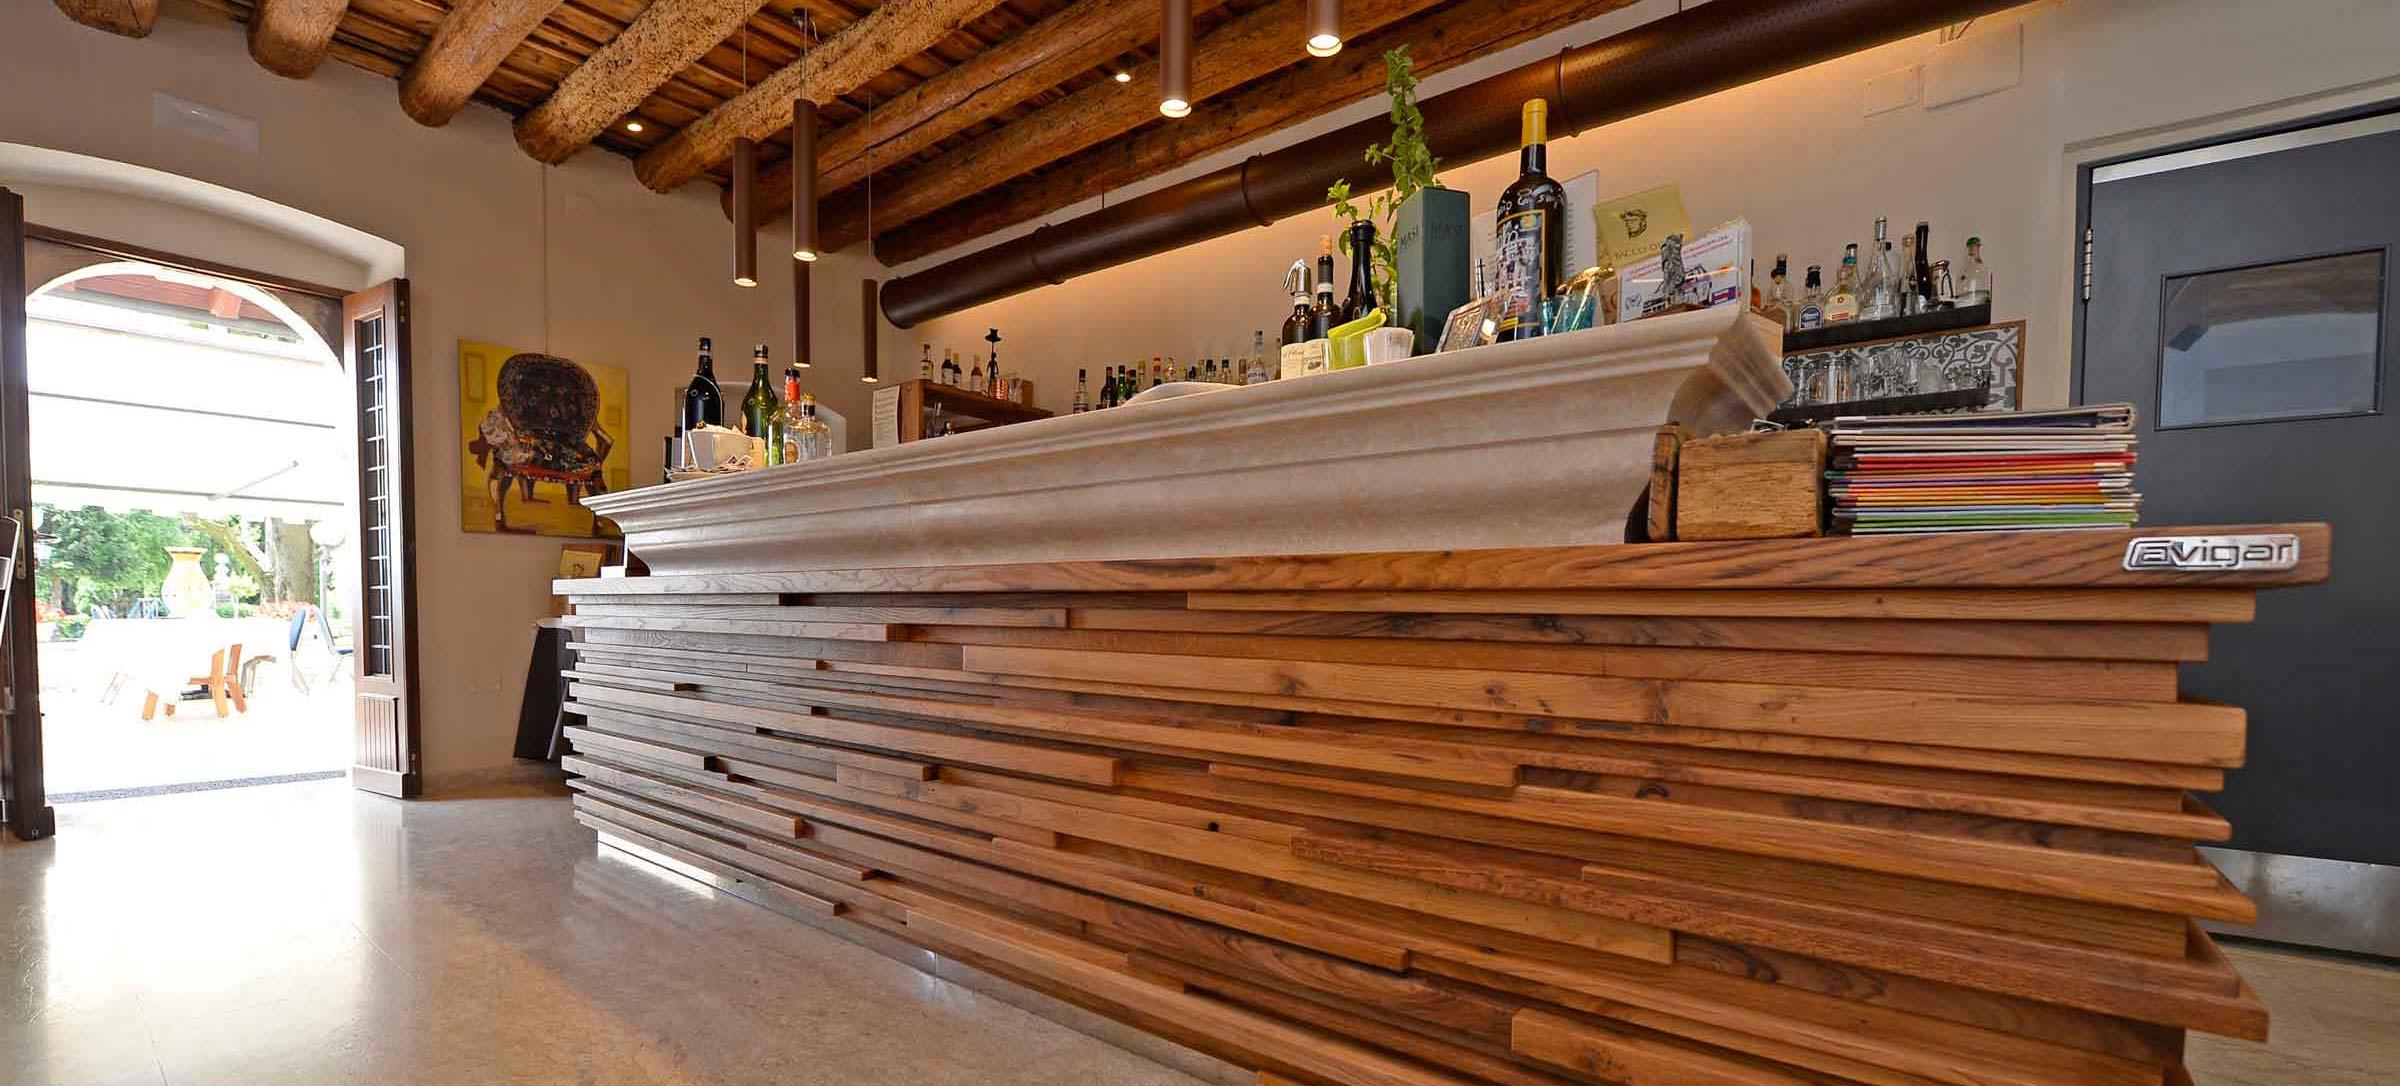 Arredamento Country Per Ristorante.Restaurants And Pizzerias Design And Furnishing